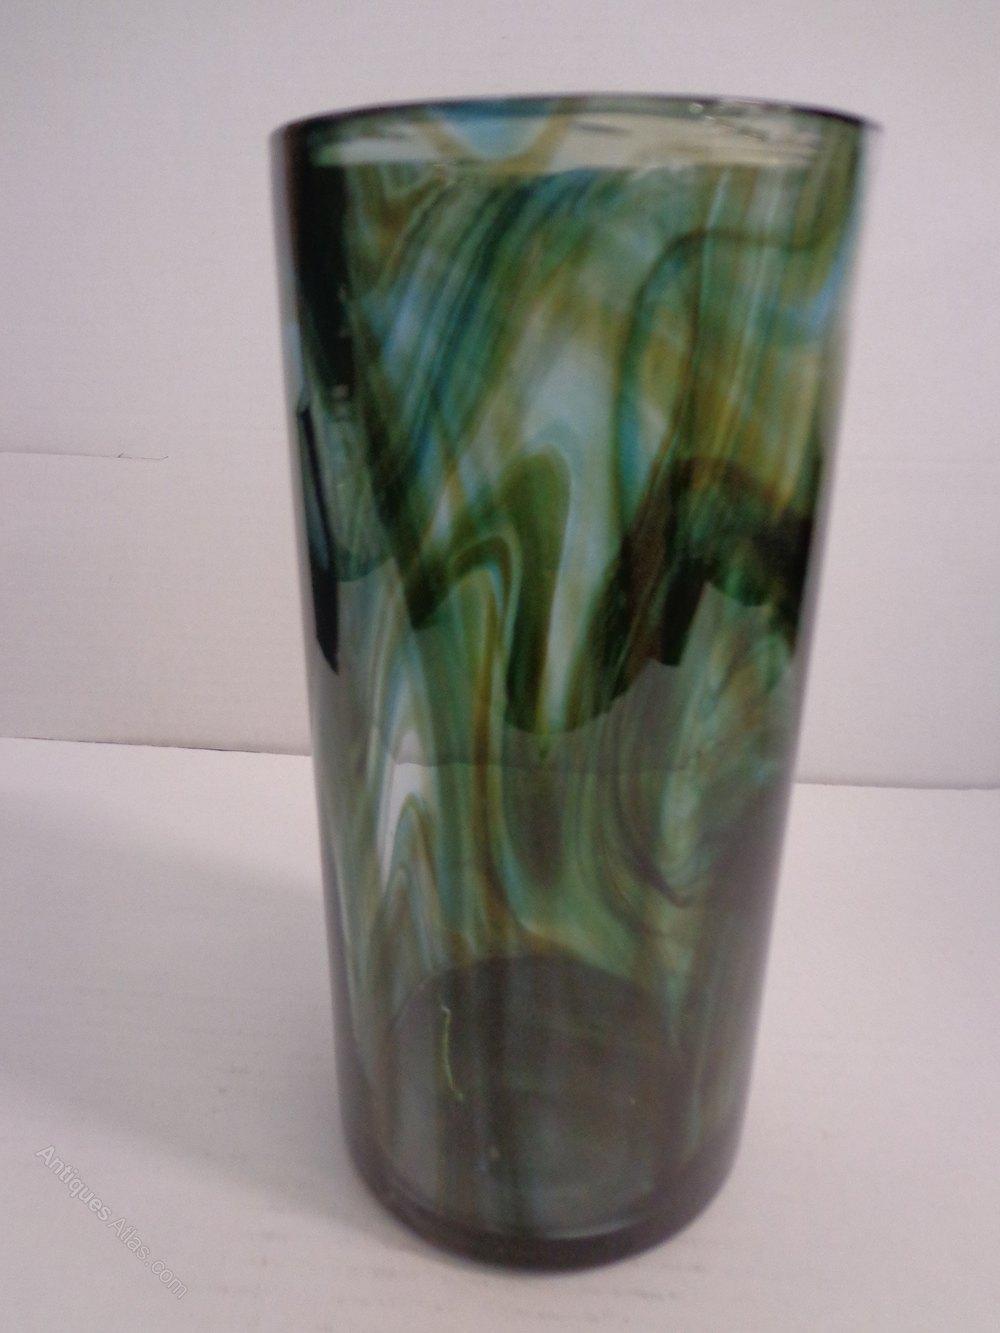 Antiques Atlas Whitefriars Green Vase By Geoffrey Baxter